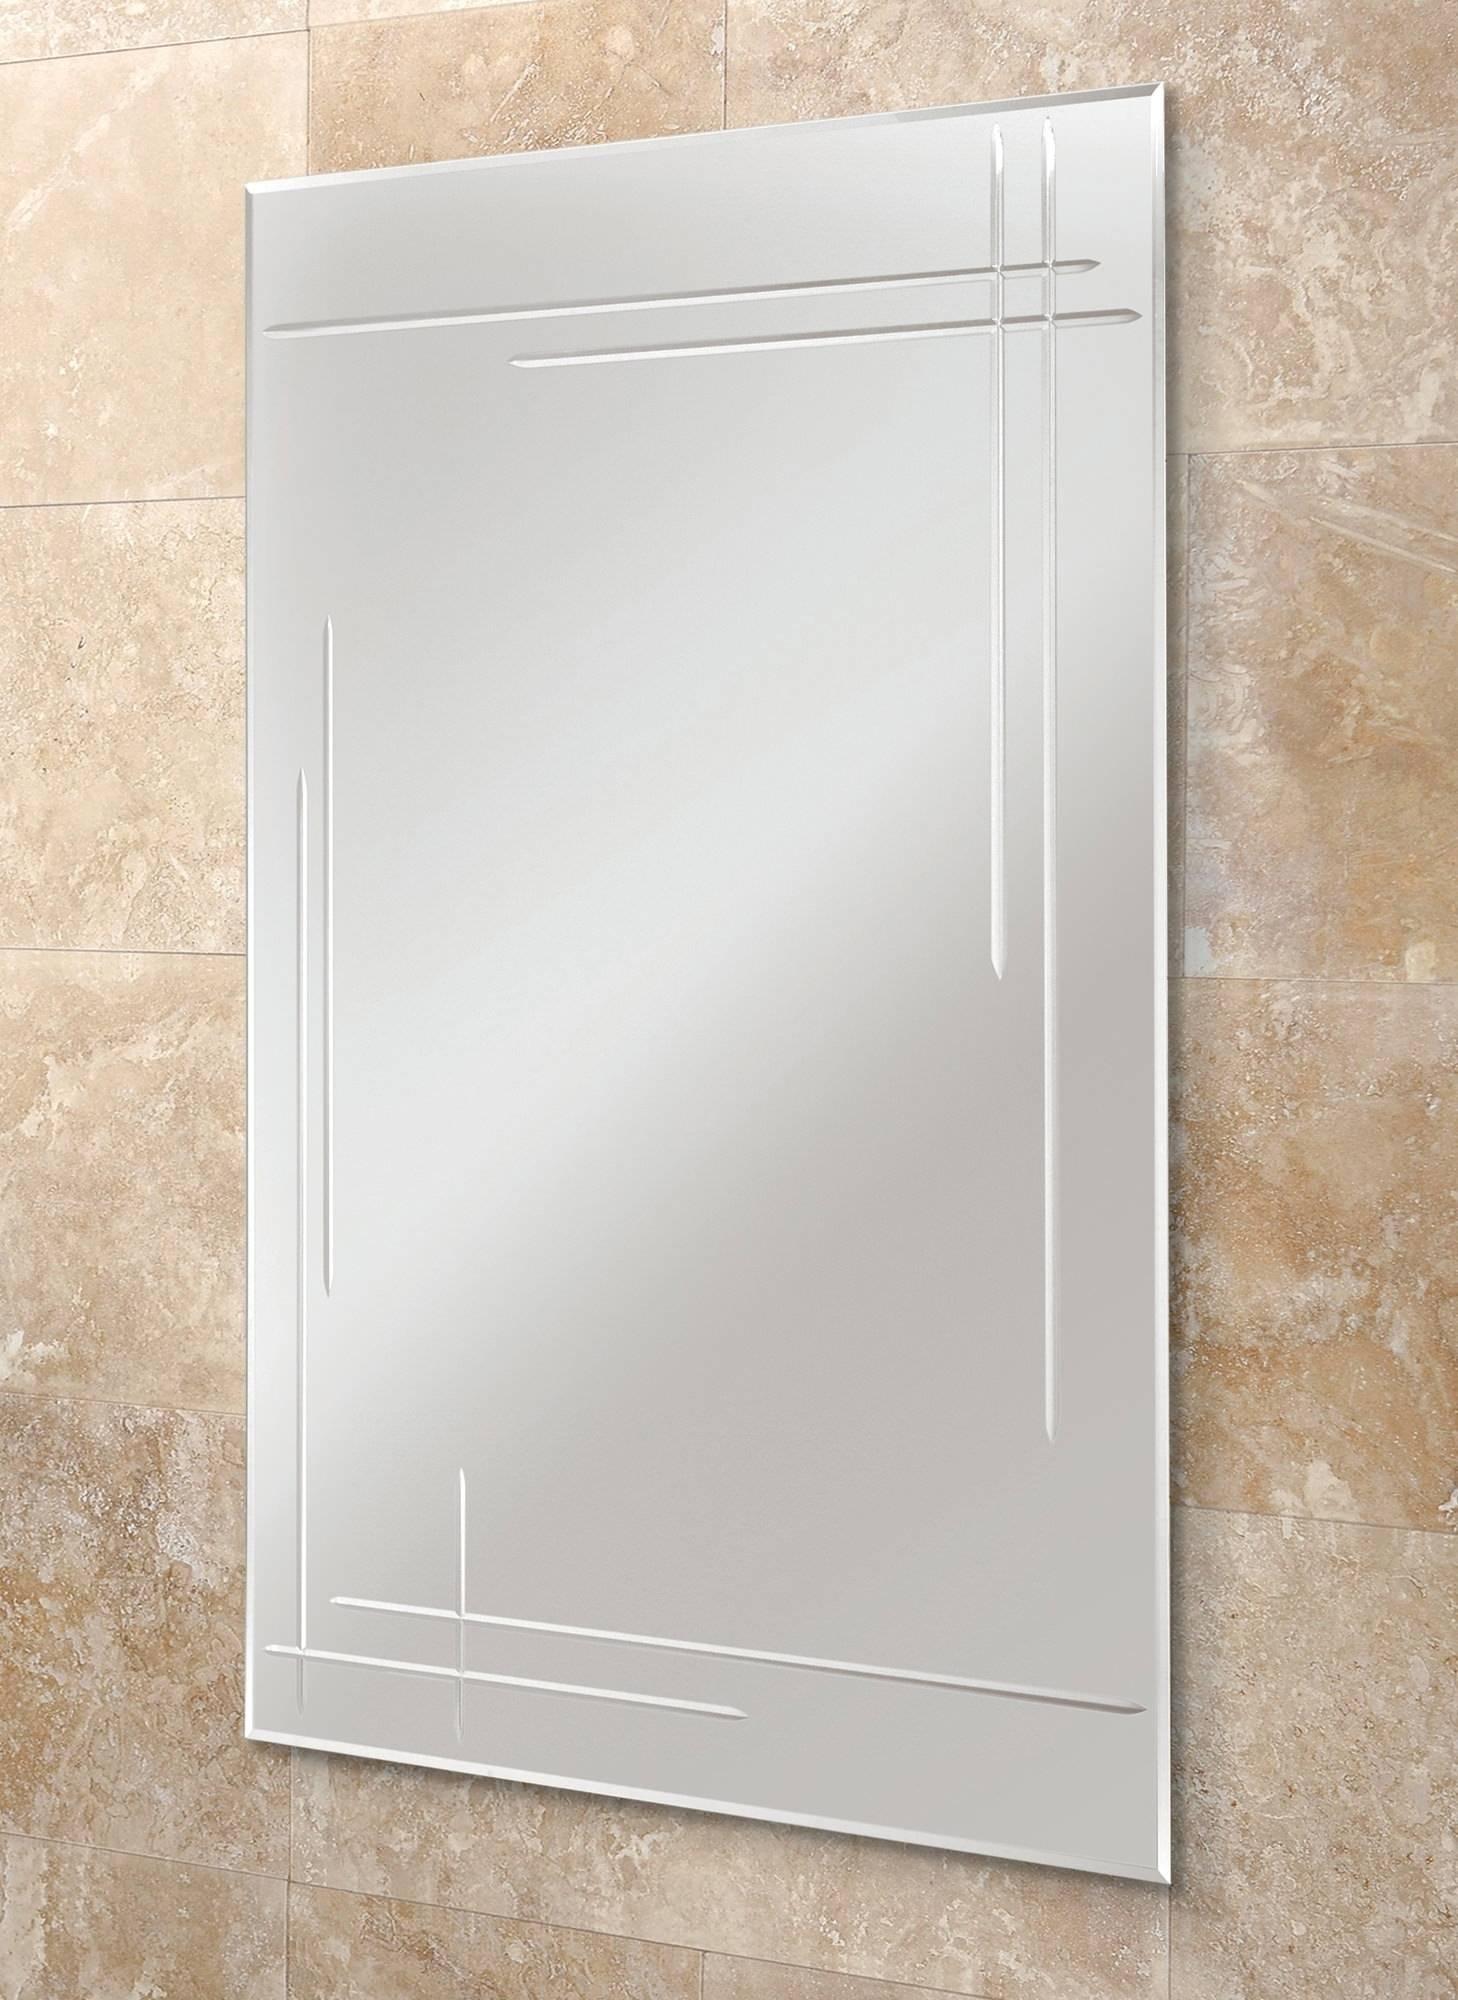 Hib Opus Rectangular Bevelled Edge Bathroom Mirror 500 X 700Mm Throughout Bevelled Edge Bathroom Mirrors (View 8 of 15)